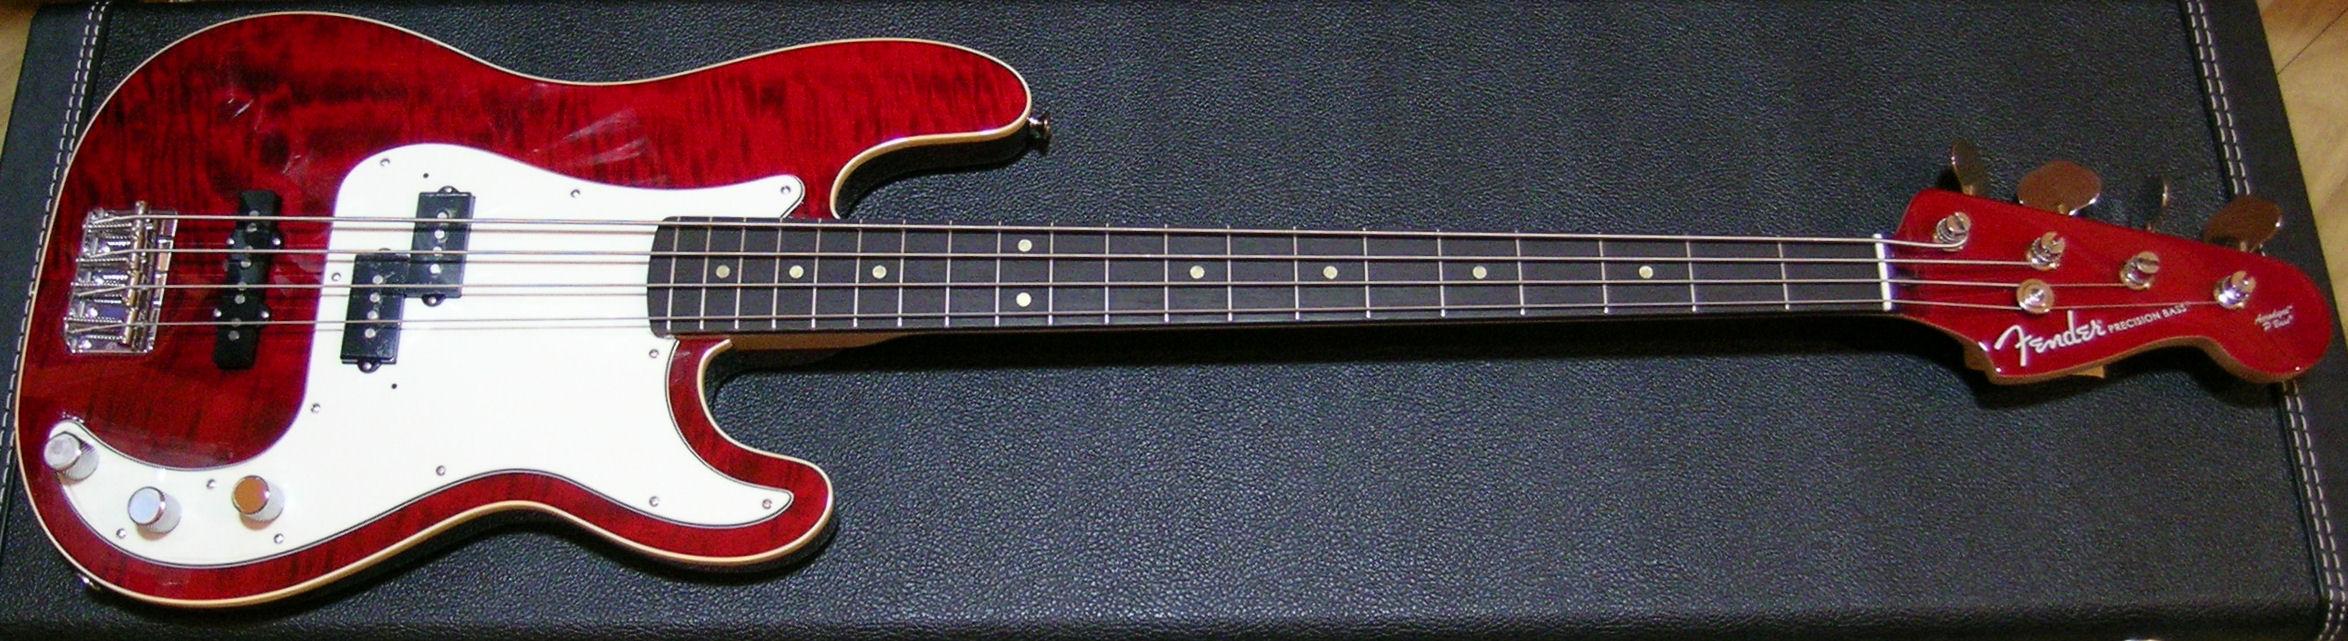 Fender Deluxe Series Aerodyne P Bass Crimson Red Transparent RW